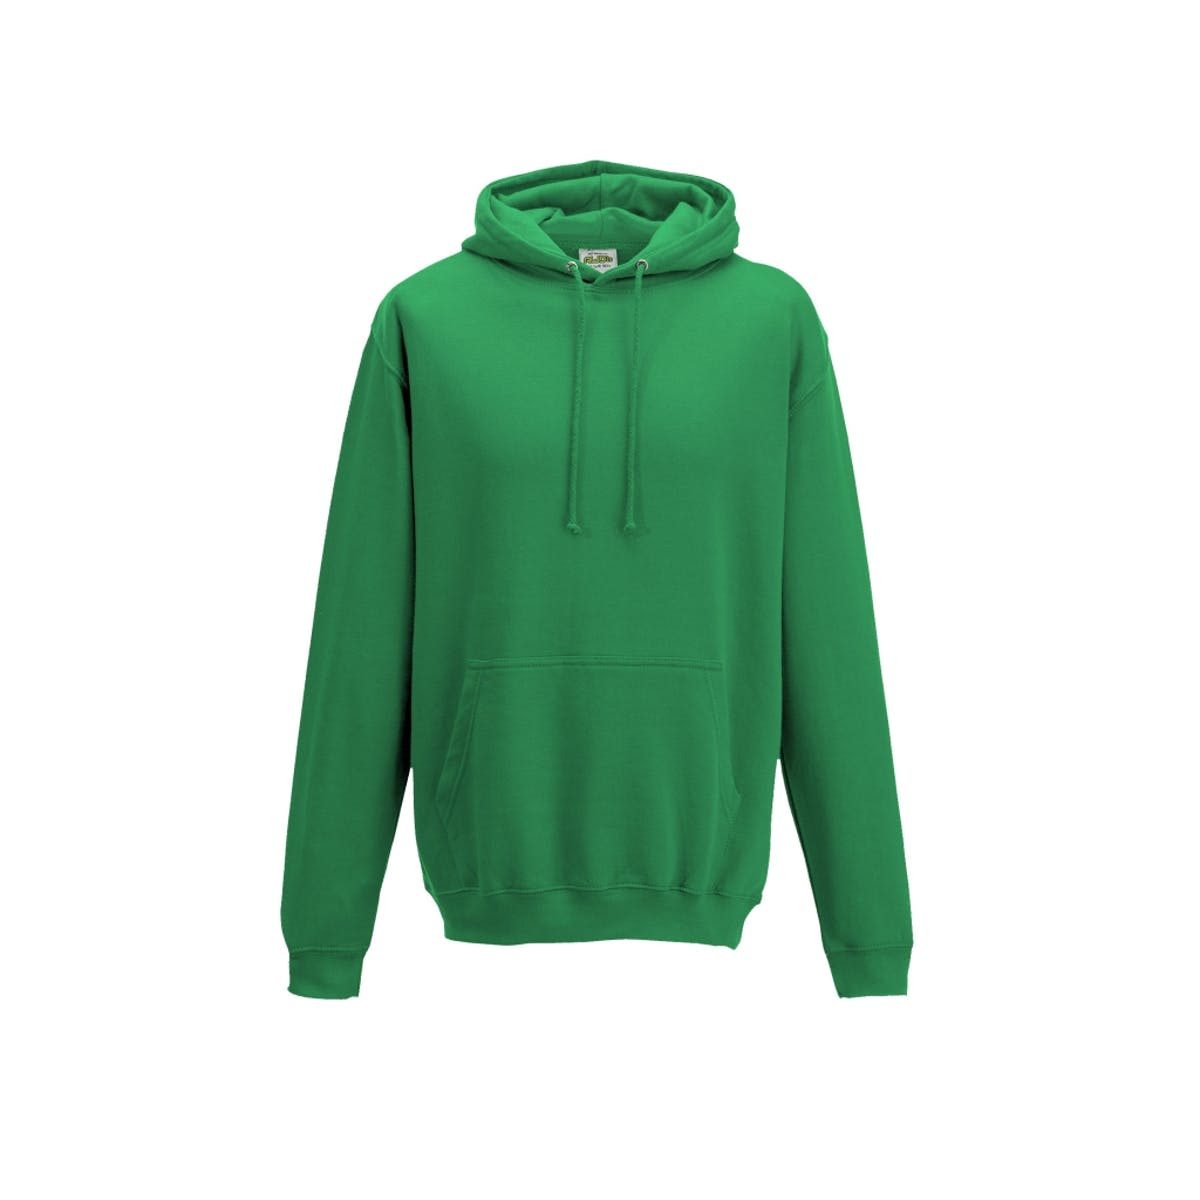 spring green college hoodies